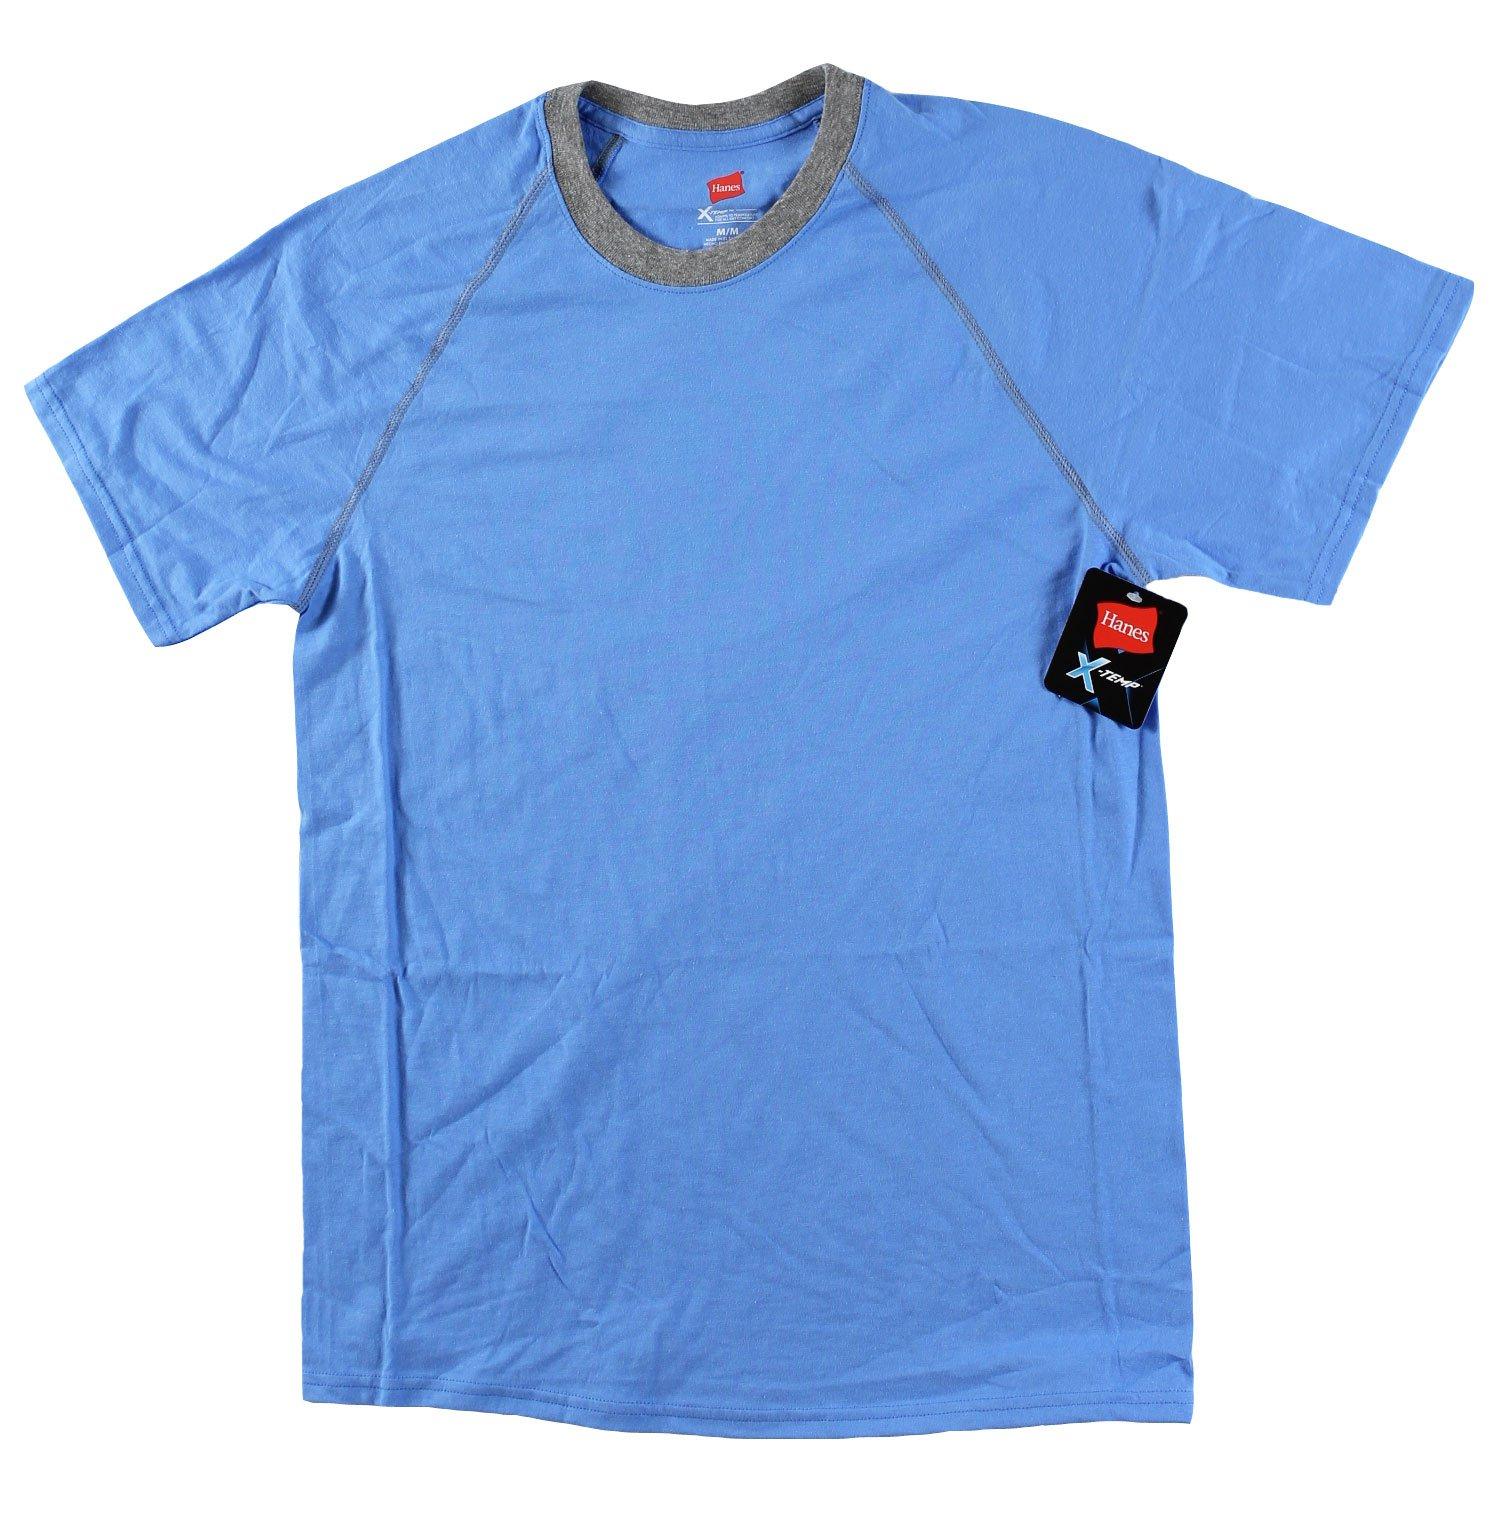 Hanes Men's 2 Pack X-Temp Performance T-Shirt (X-Large, Sky Blue / Grey)